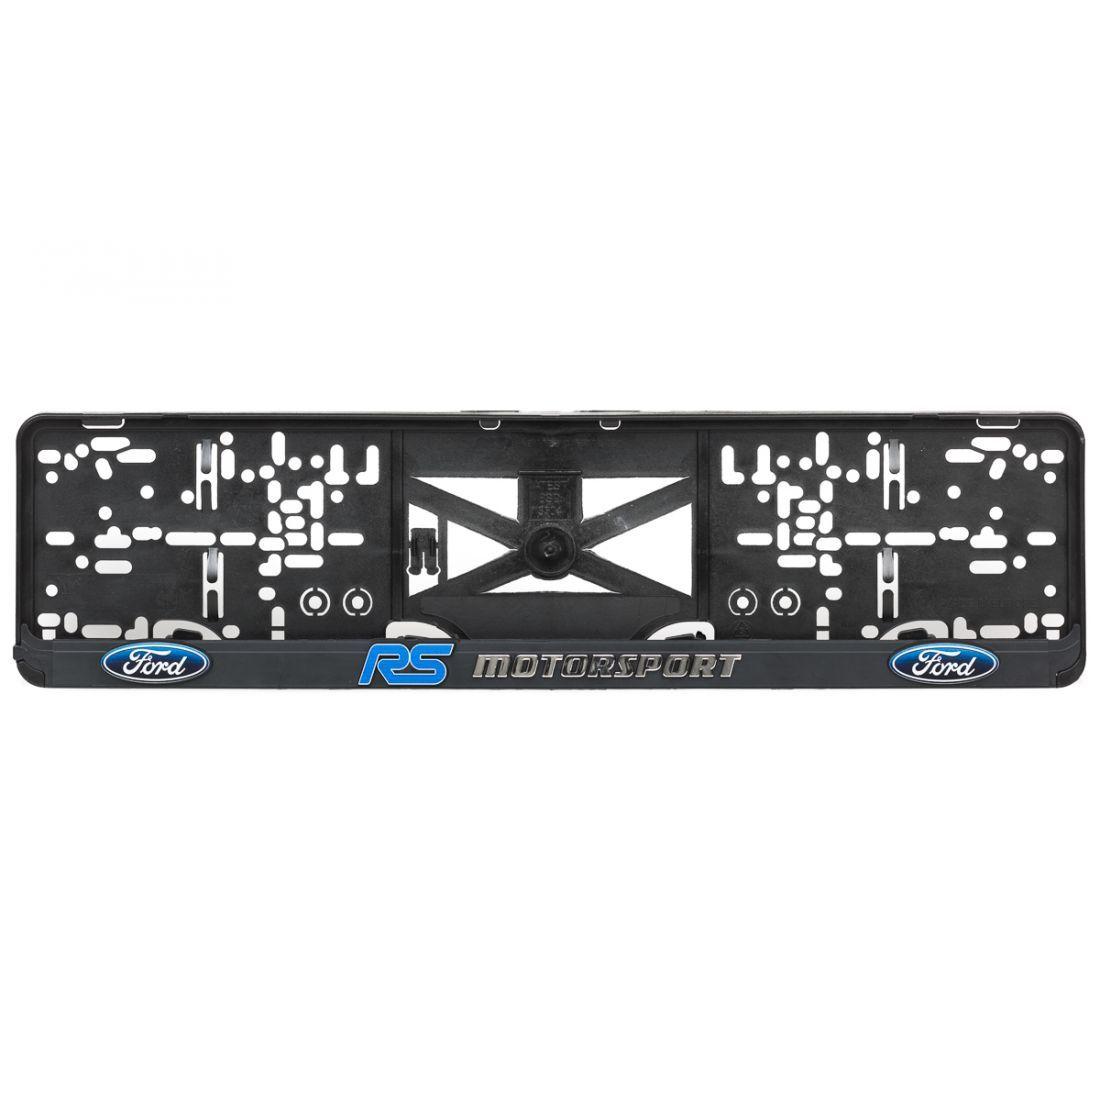 Podložka pod ŠPZ 3D FORD RS Motorsport